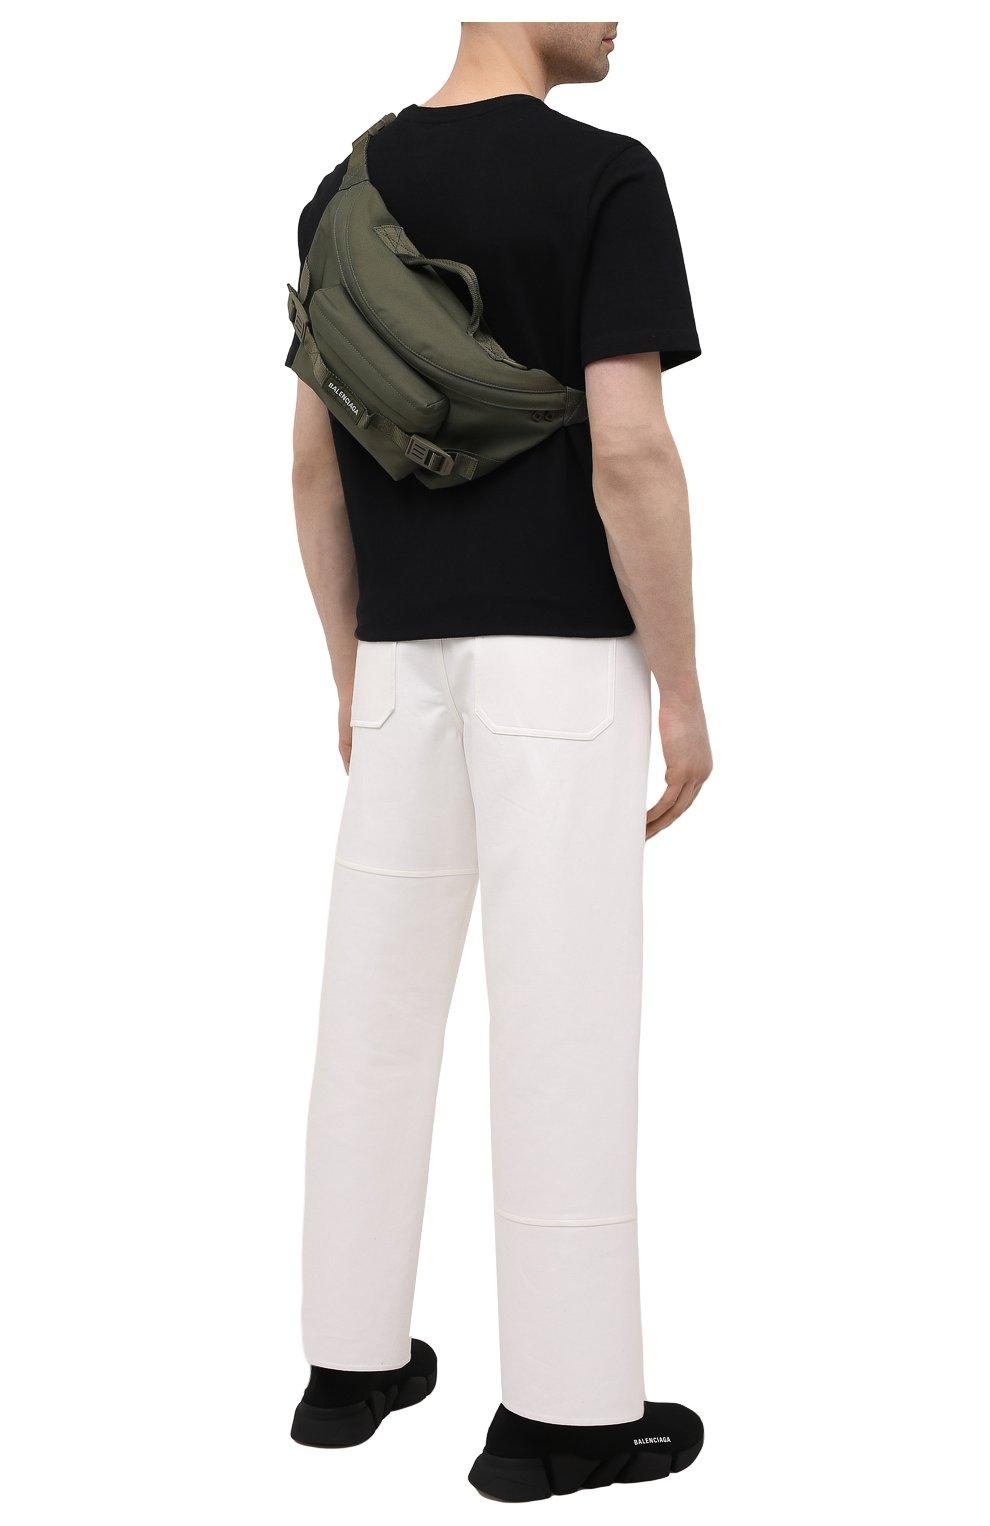 Мужская текстильная поясная сумка army BALENCIAGA хаки цвета, арт. 644035/2BKPI   Фото 2 (Ремень/цепочка: На ремешке; Материал: Текстиль)